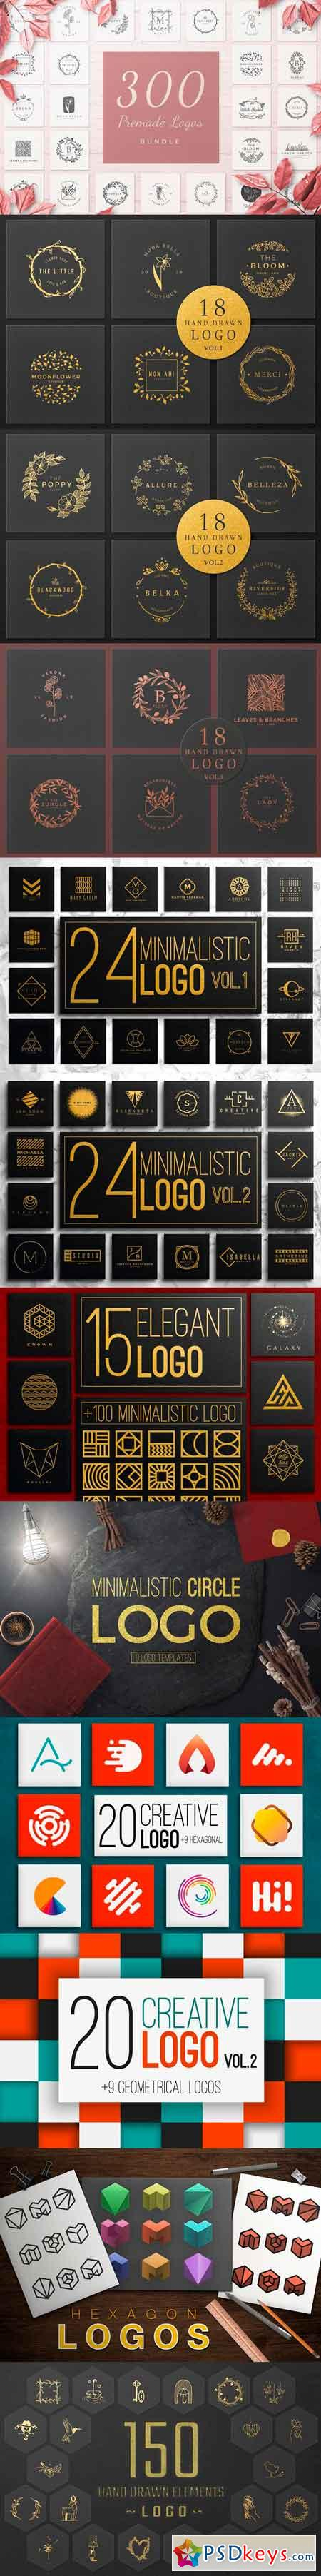 300 Premade Logos Bundle 2871116